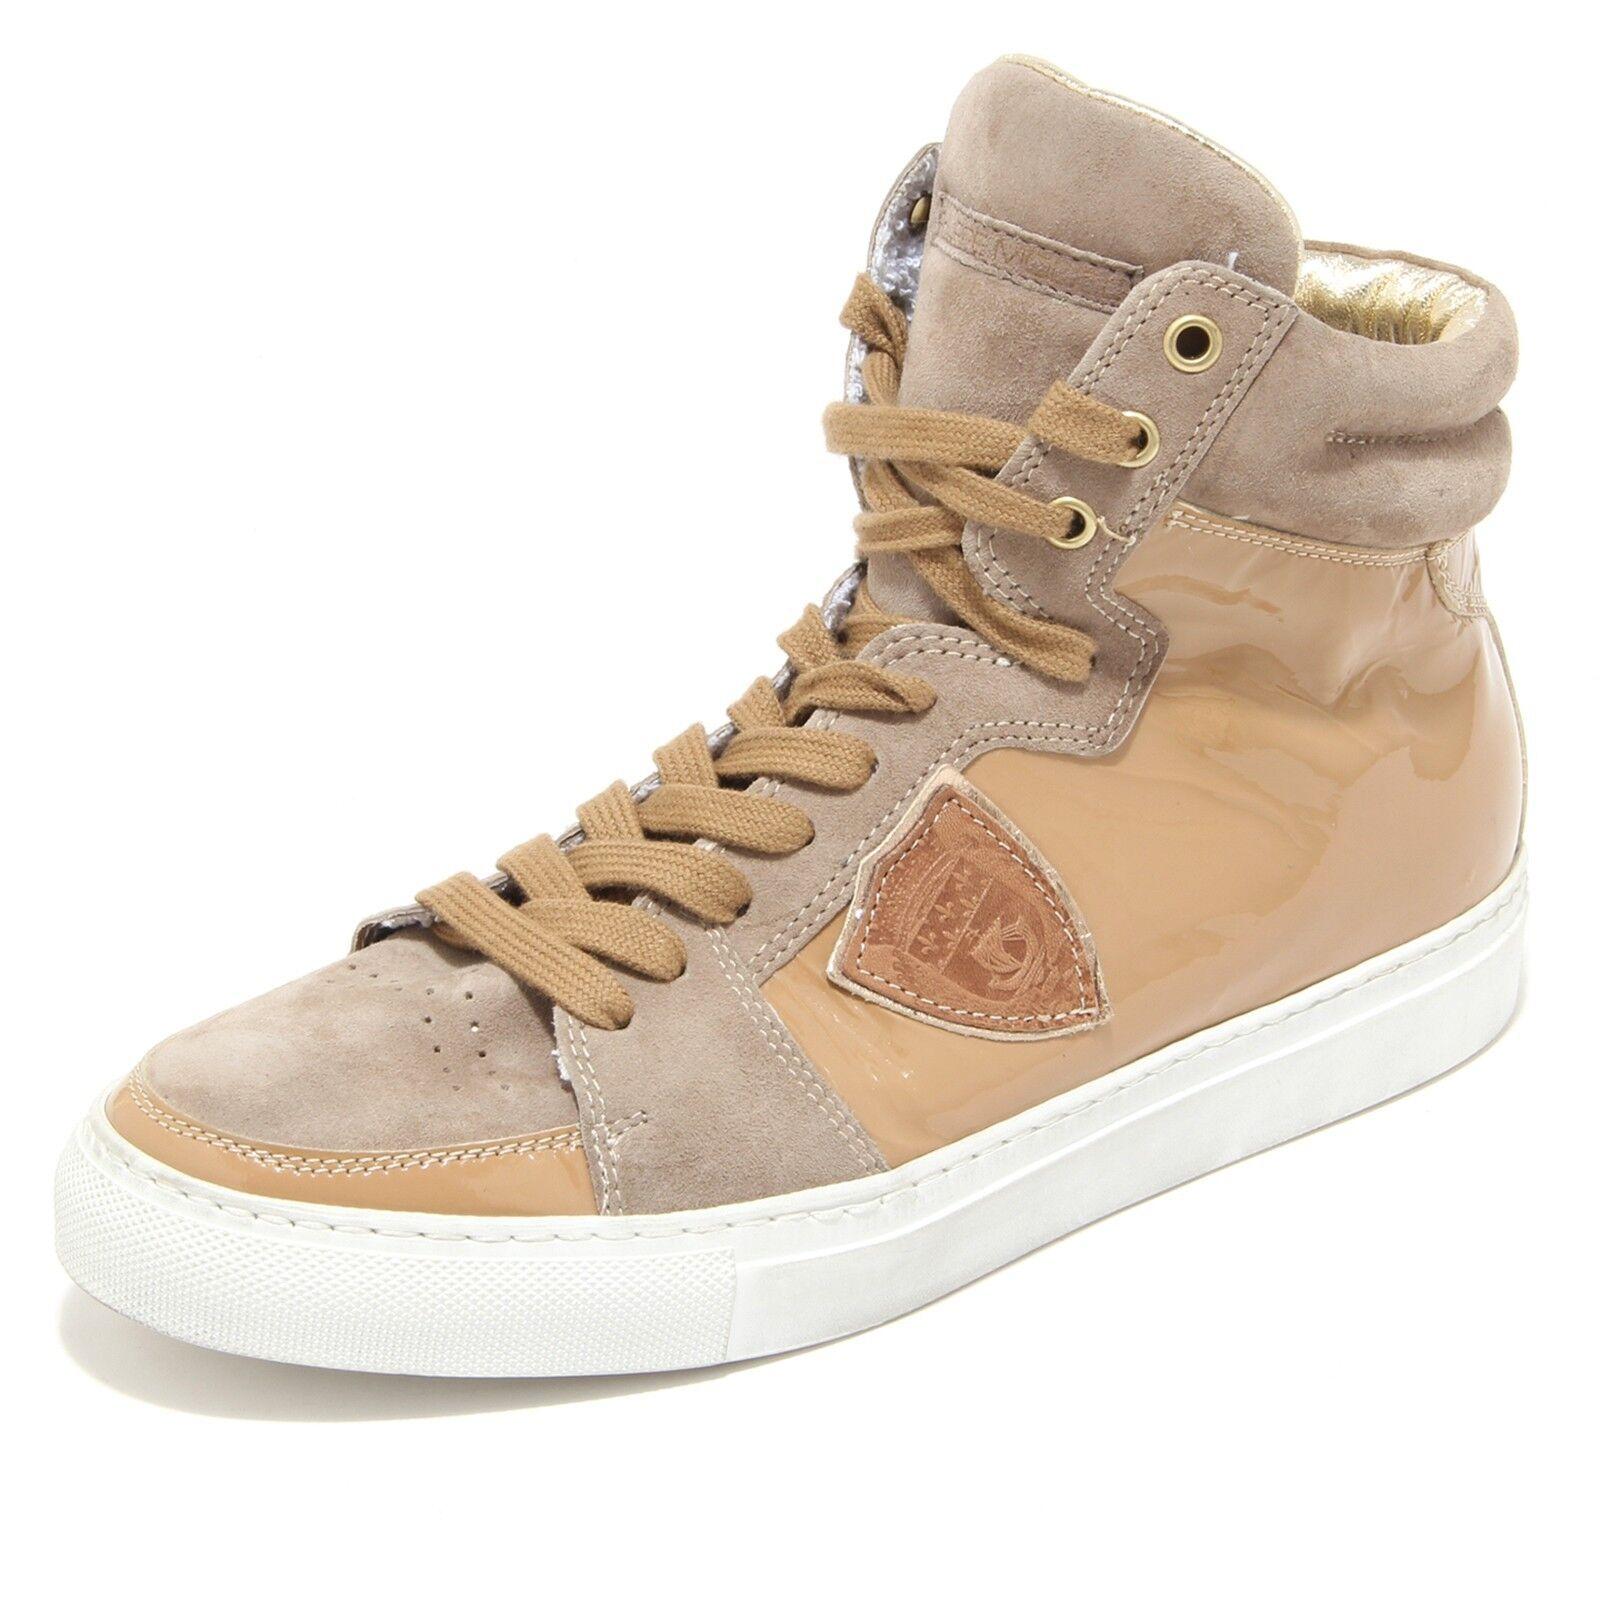 4432m Man Sneakers Philippe Model Atelier high shoes men shoes